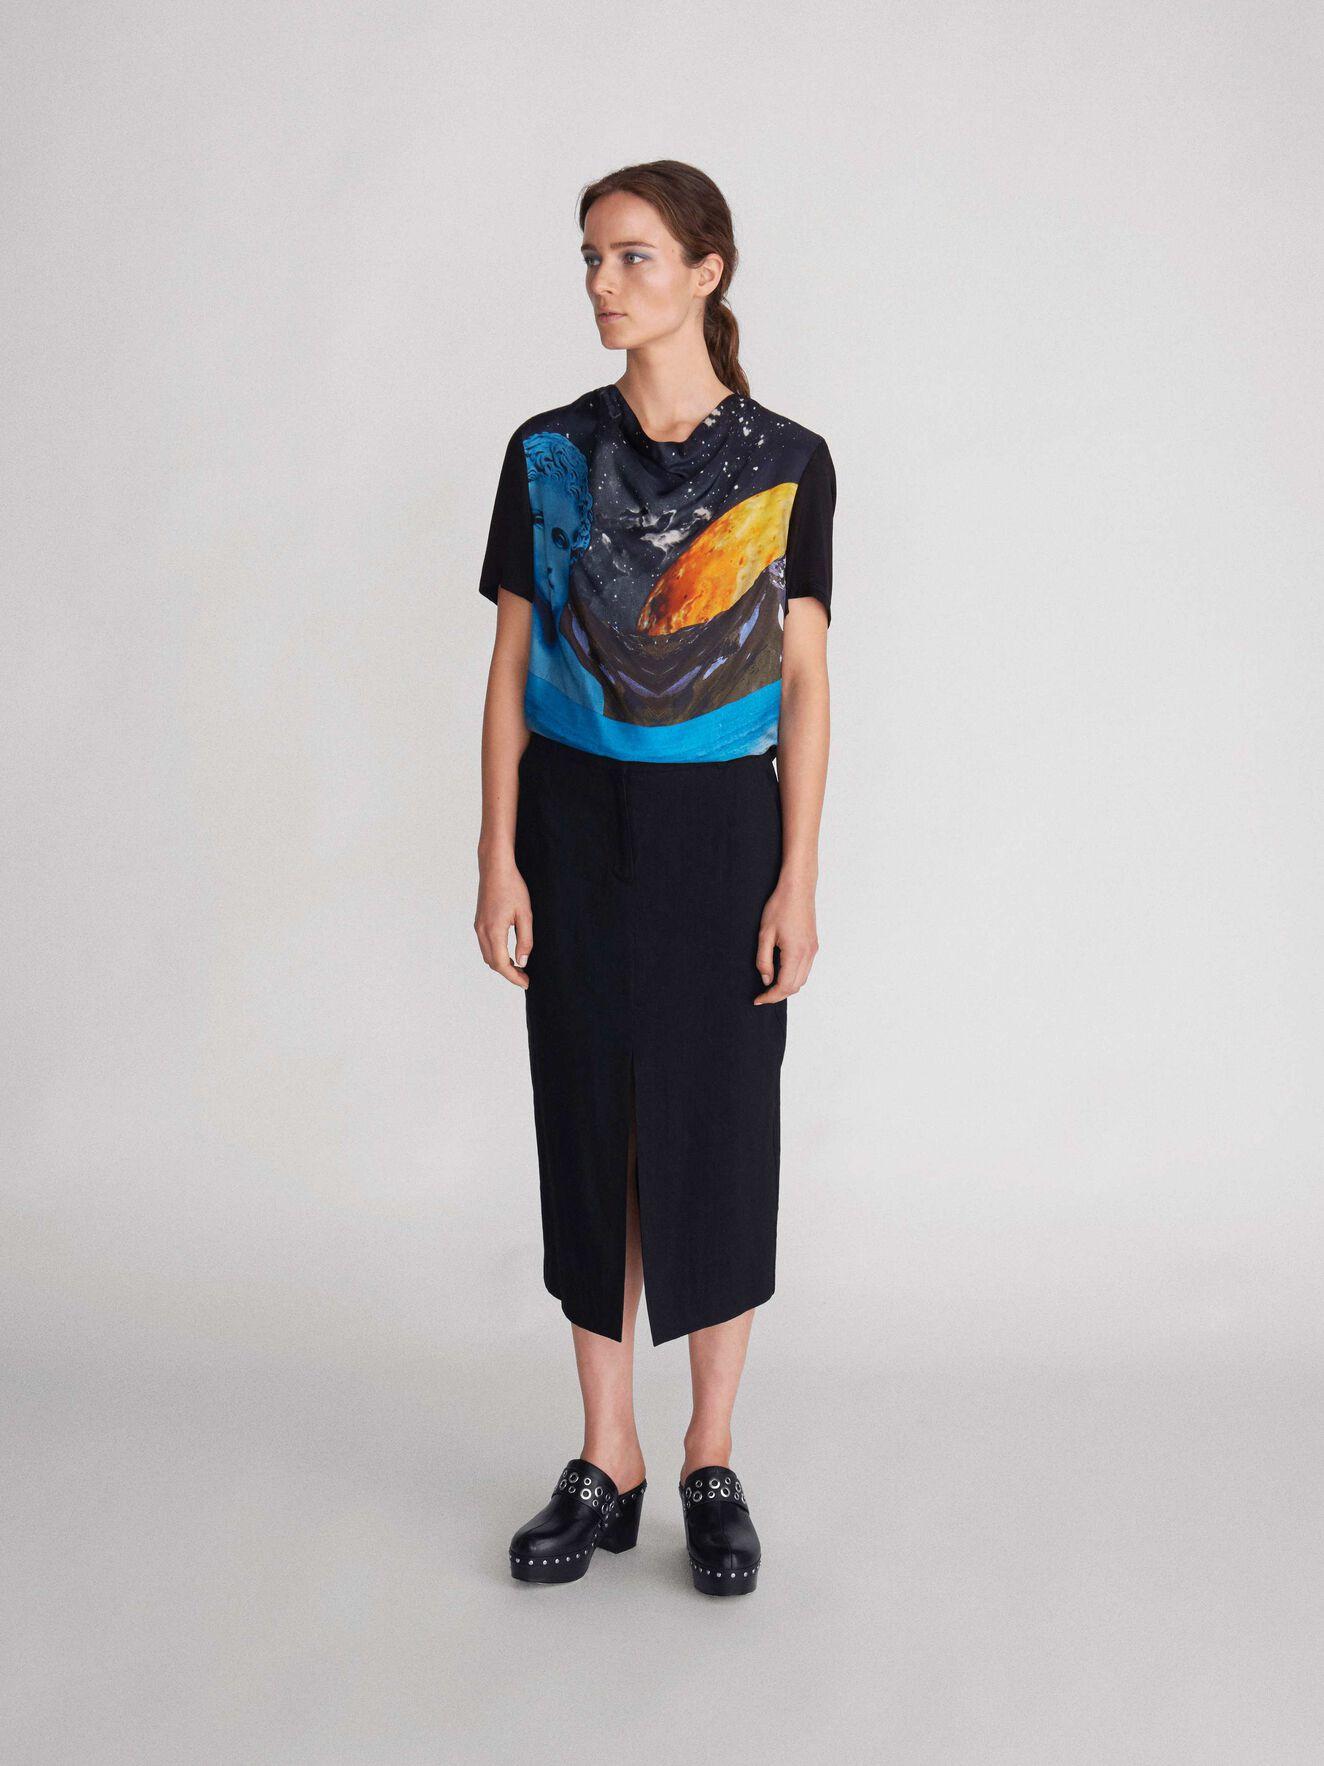 Dream Skirt in Black from Tiger of Sweden